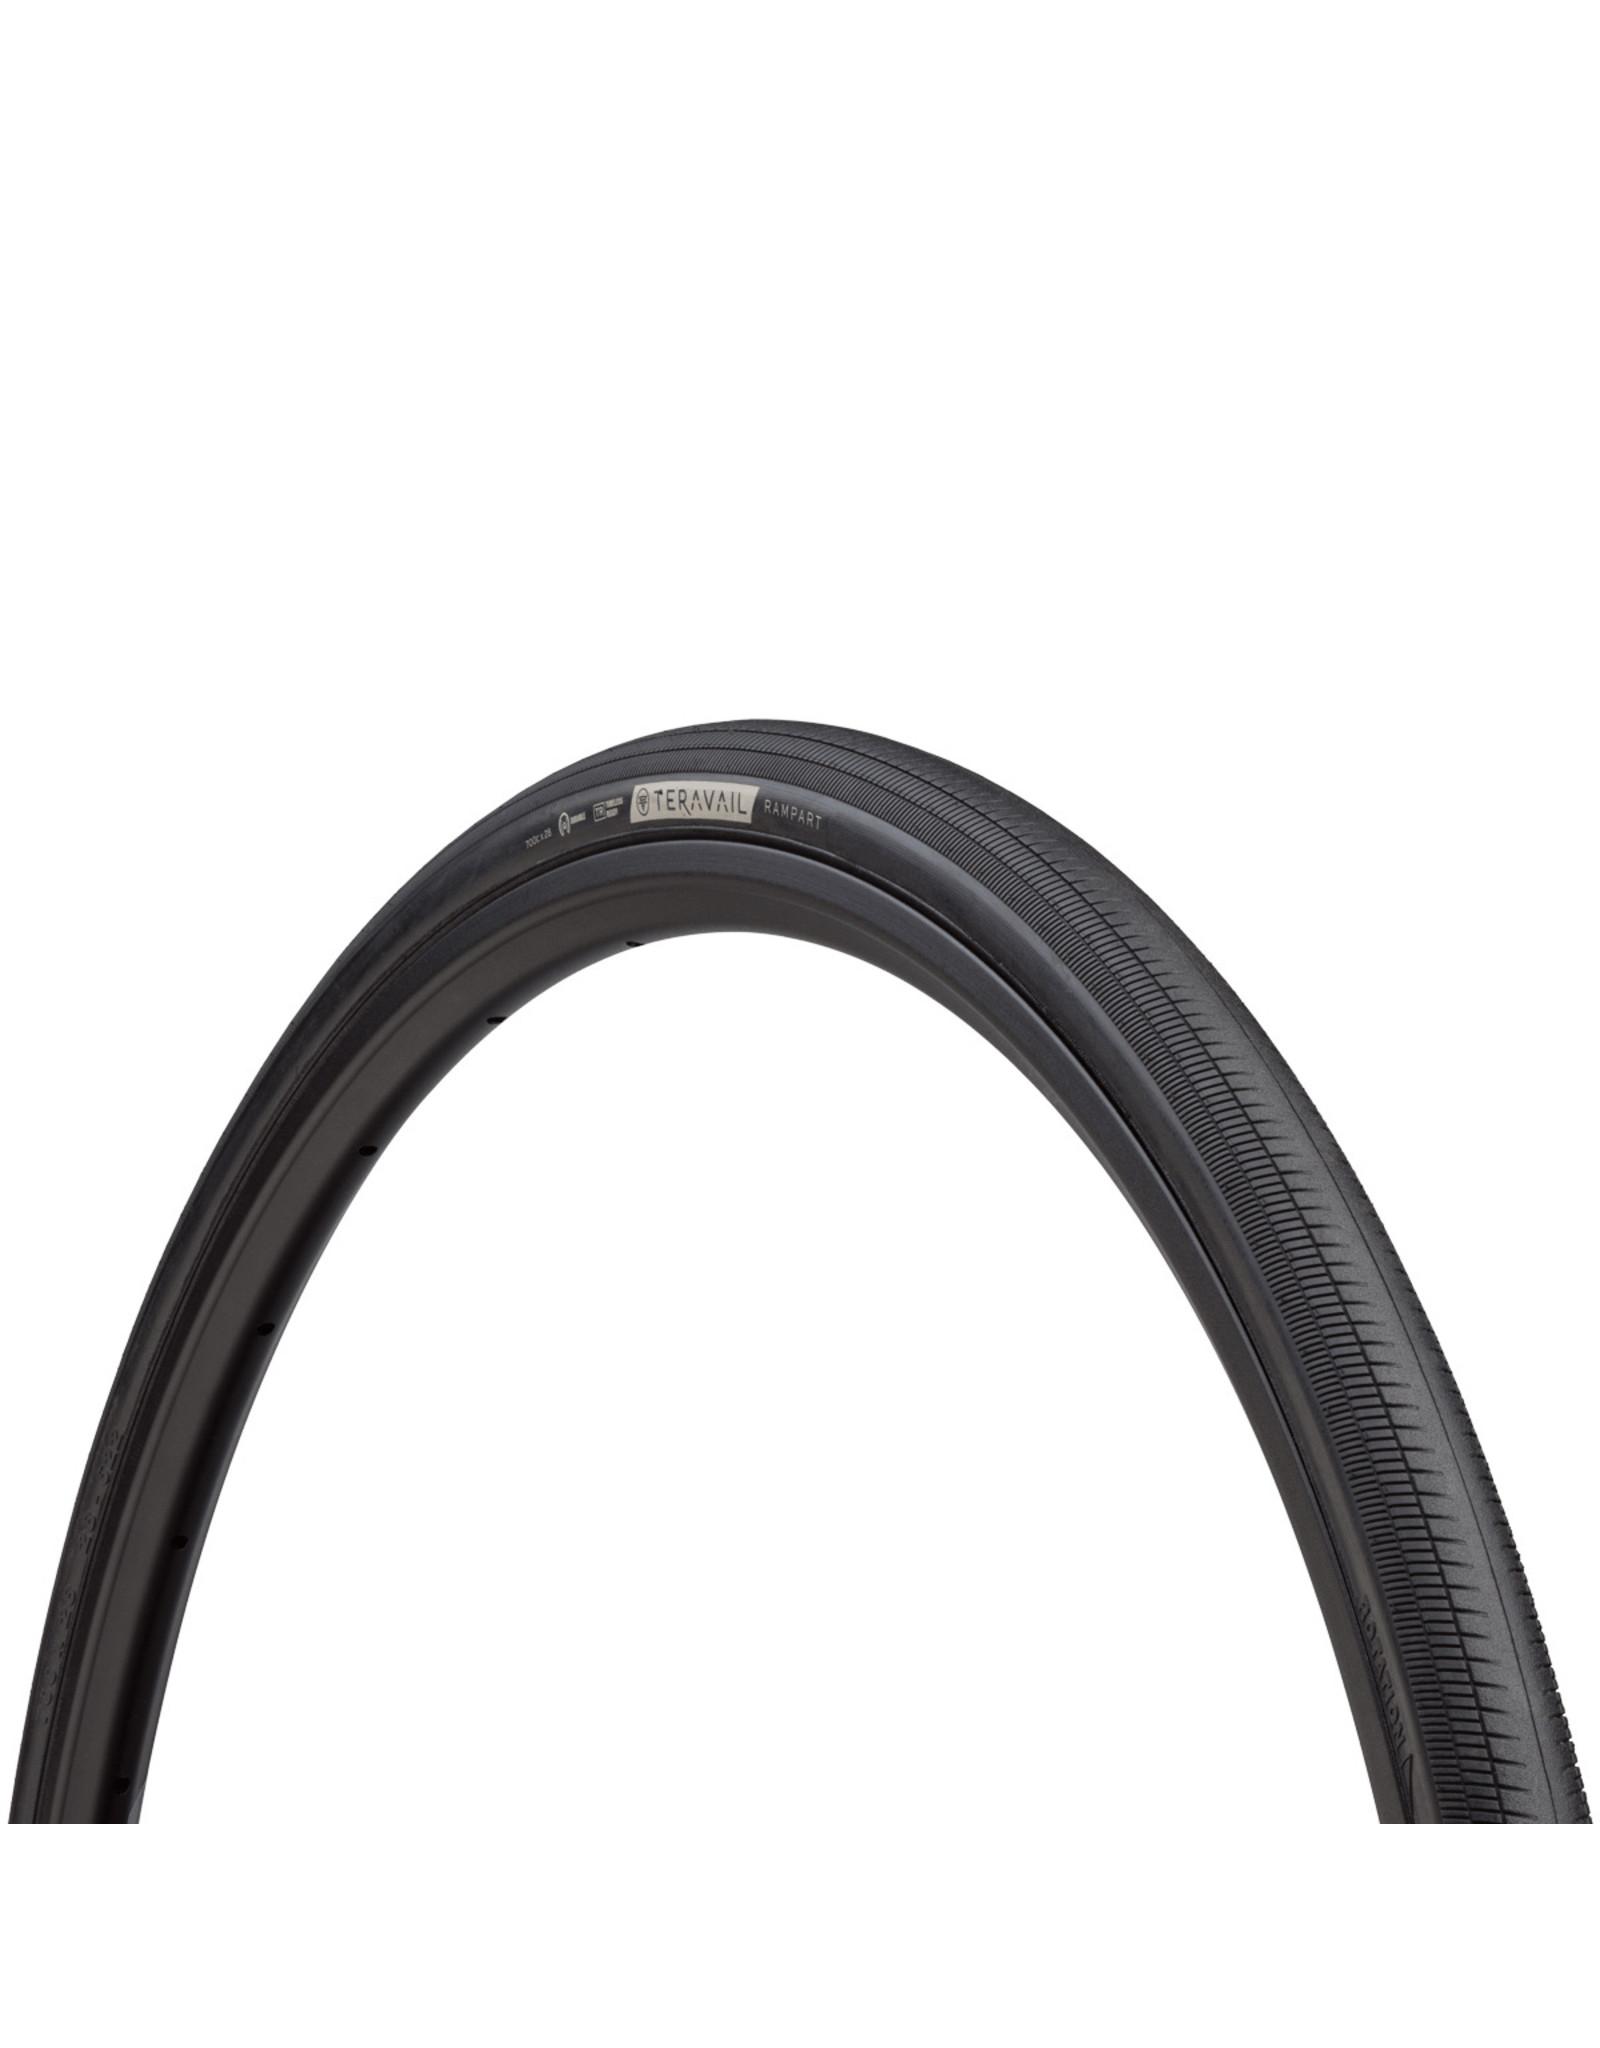 Teravail - Rampart Light & Supple Tyre - 28c x 700 - Black